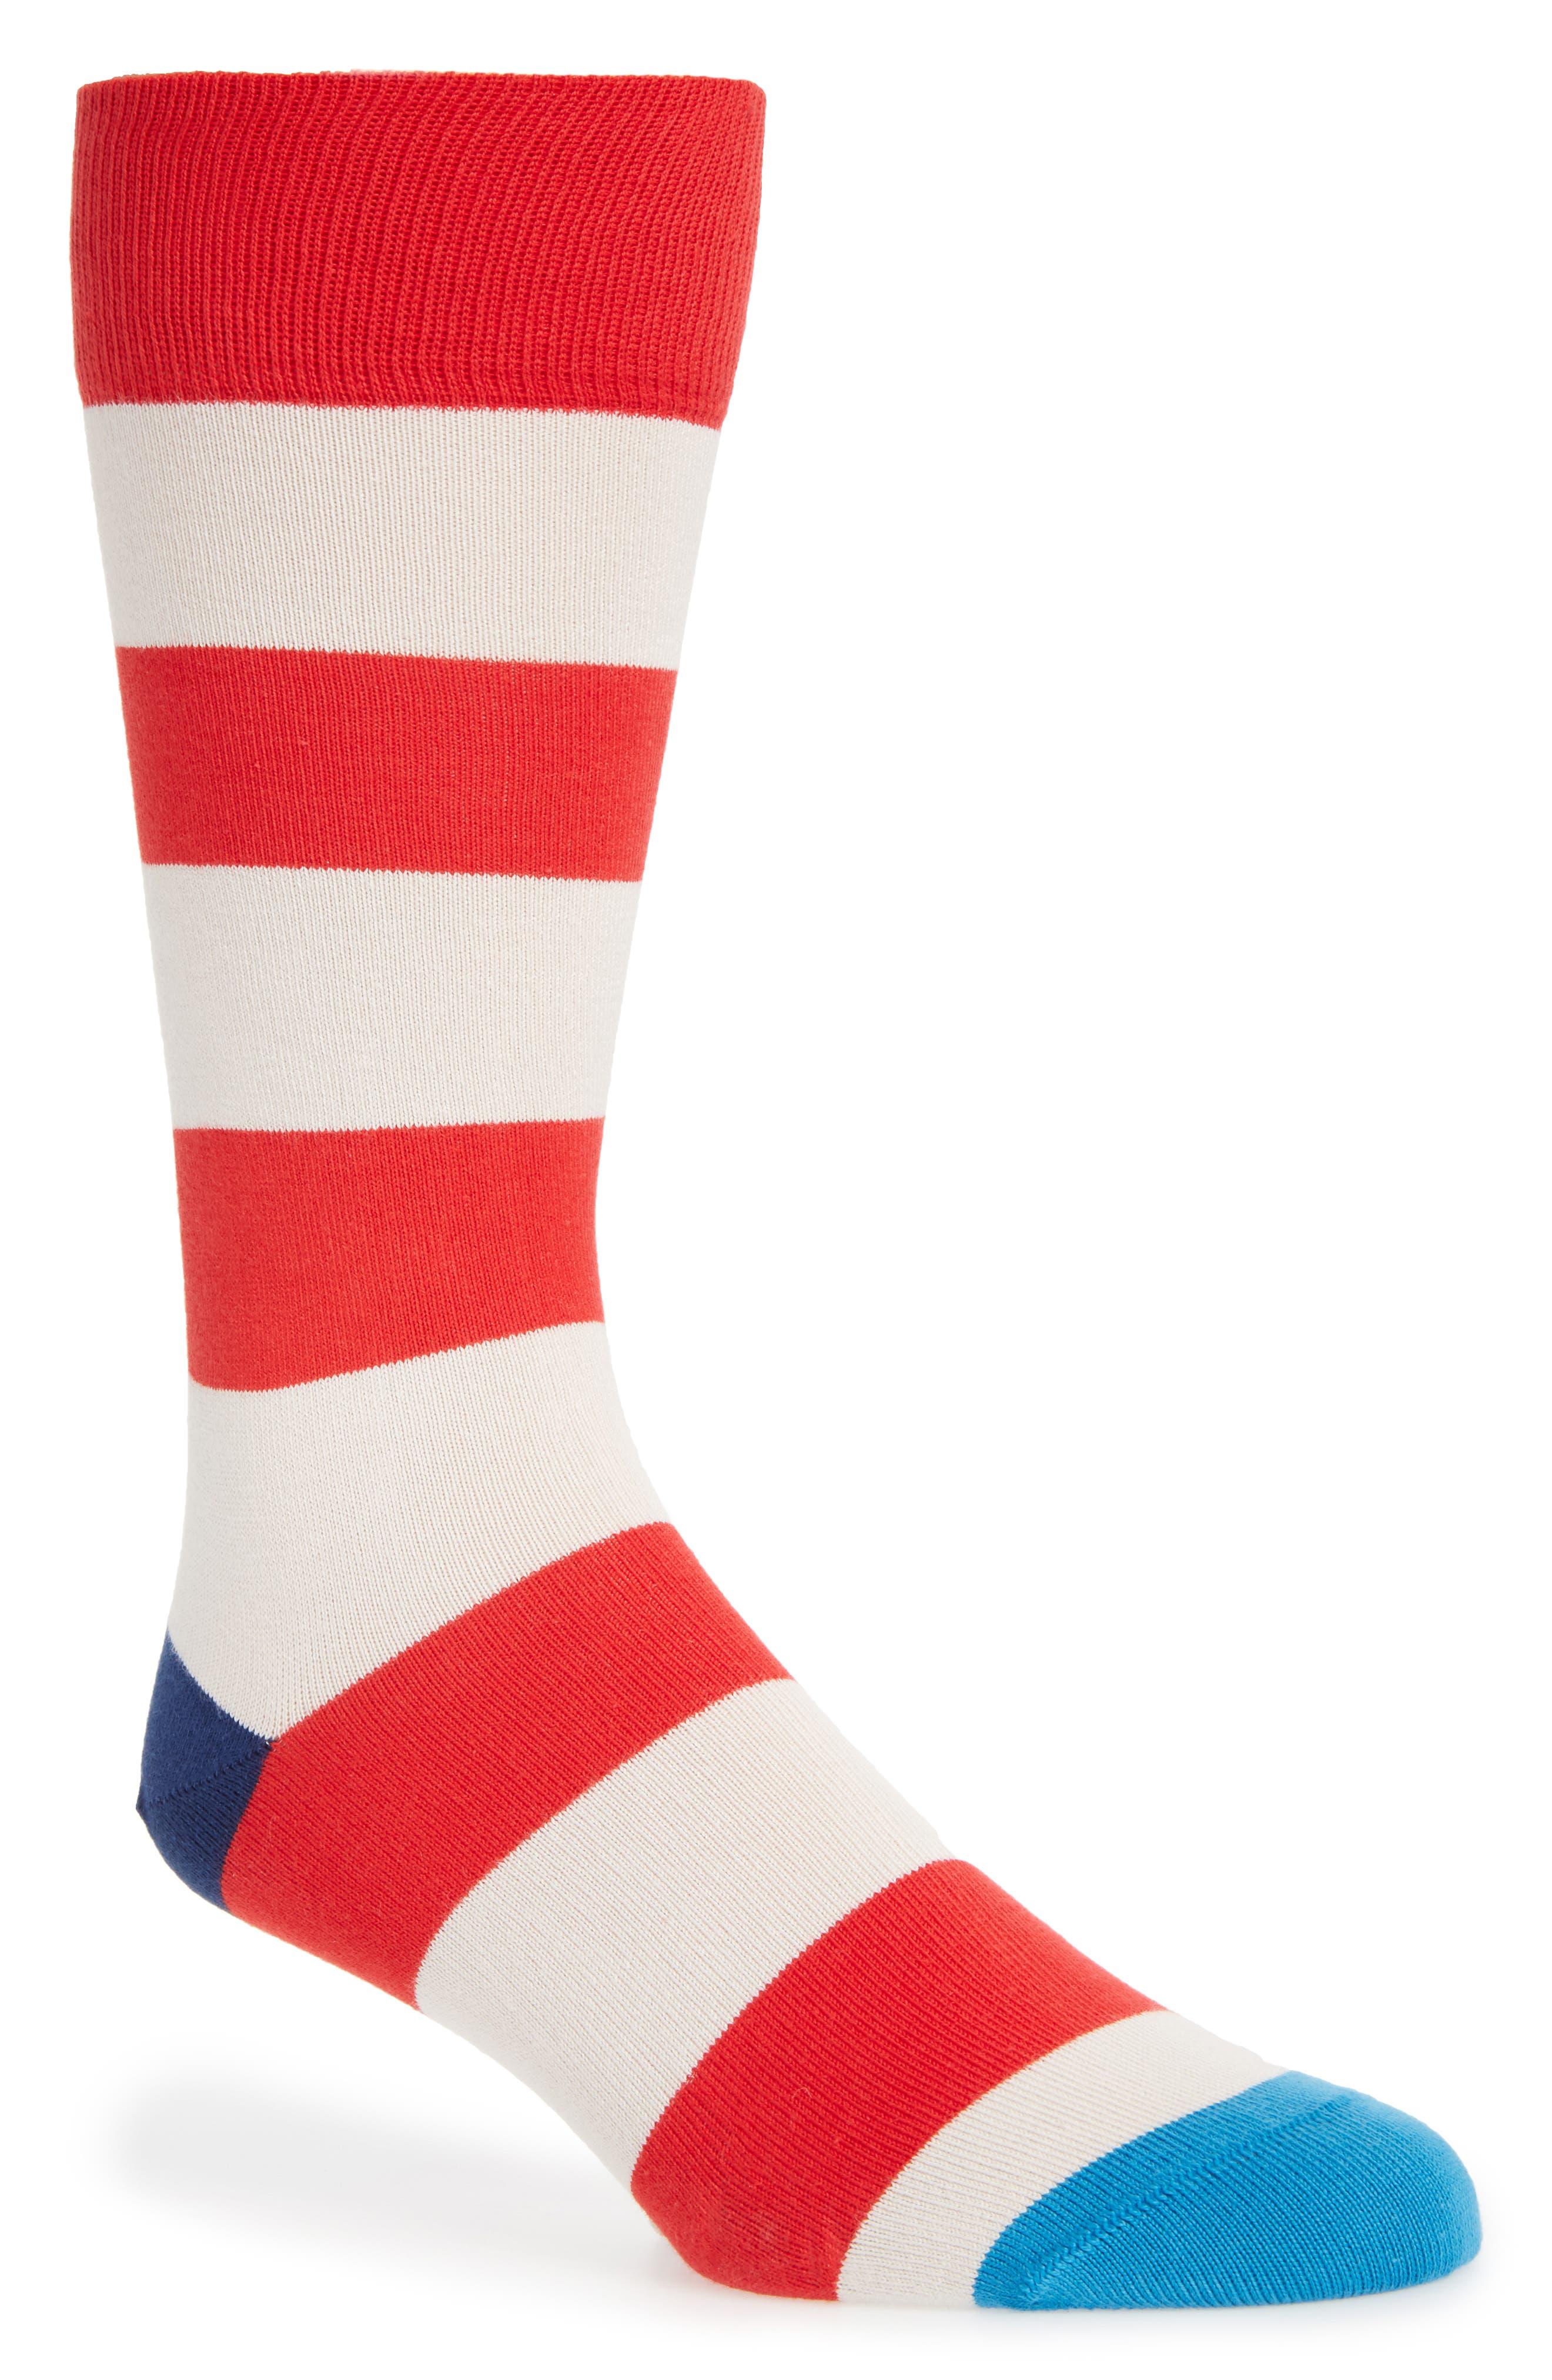 Paul Smith Parton Socks